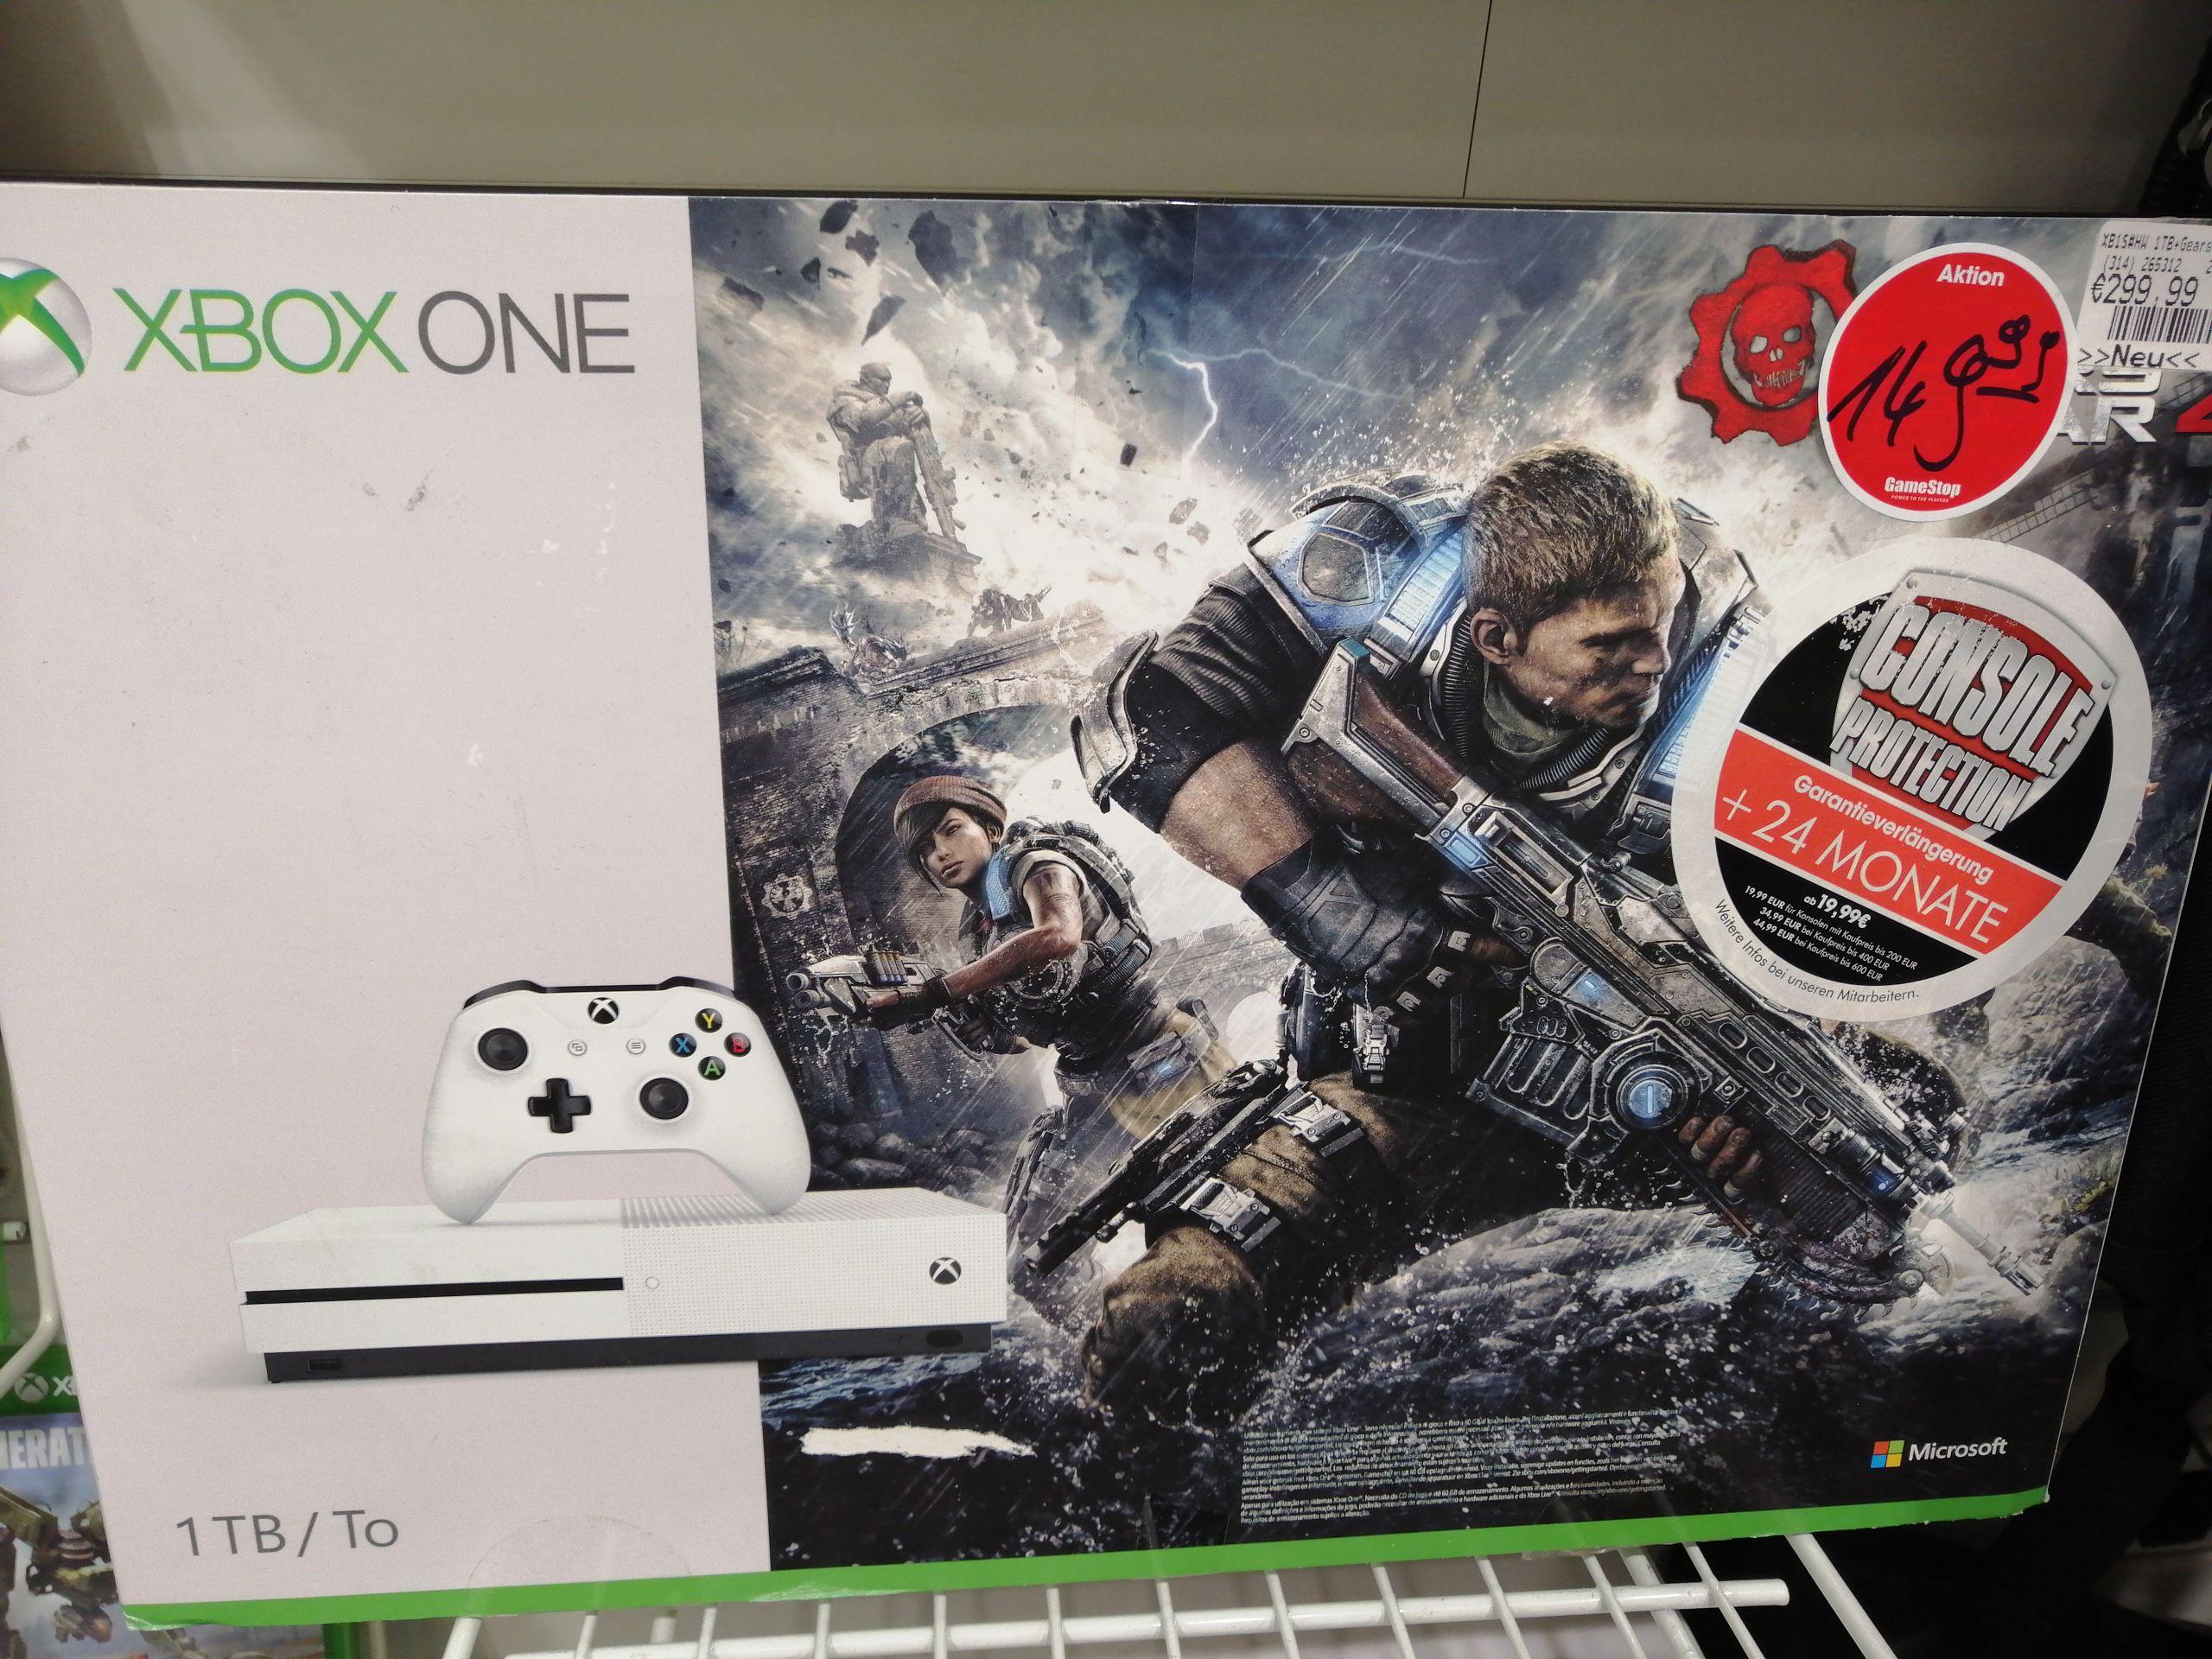 Lokal Mülheim Xbox One 1tb inkl. Gears of War